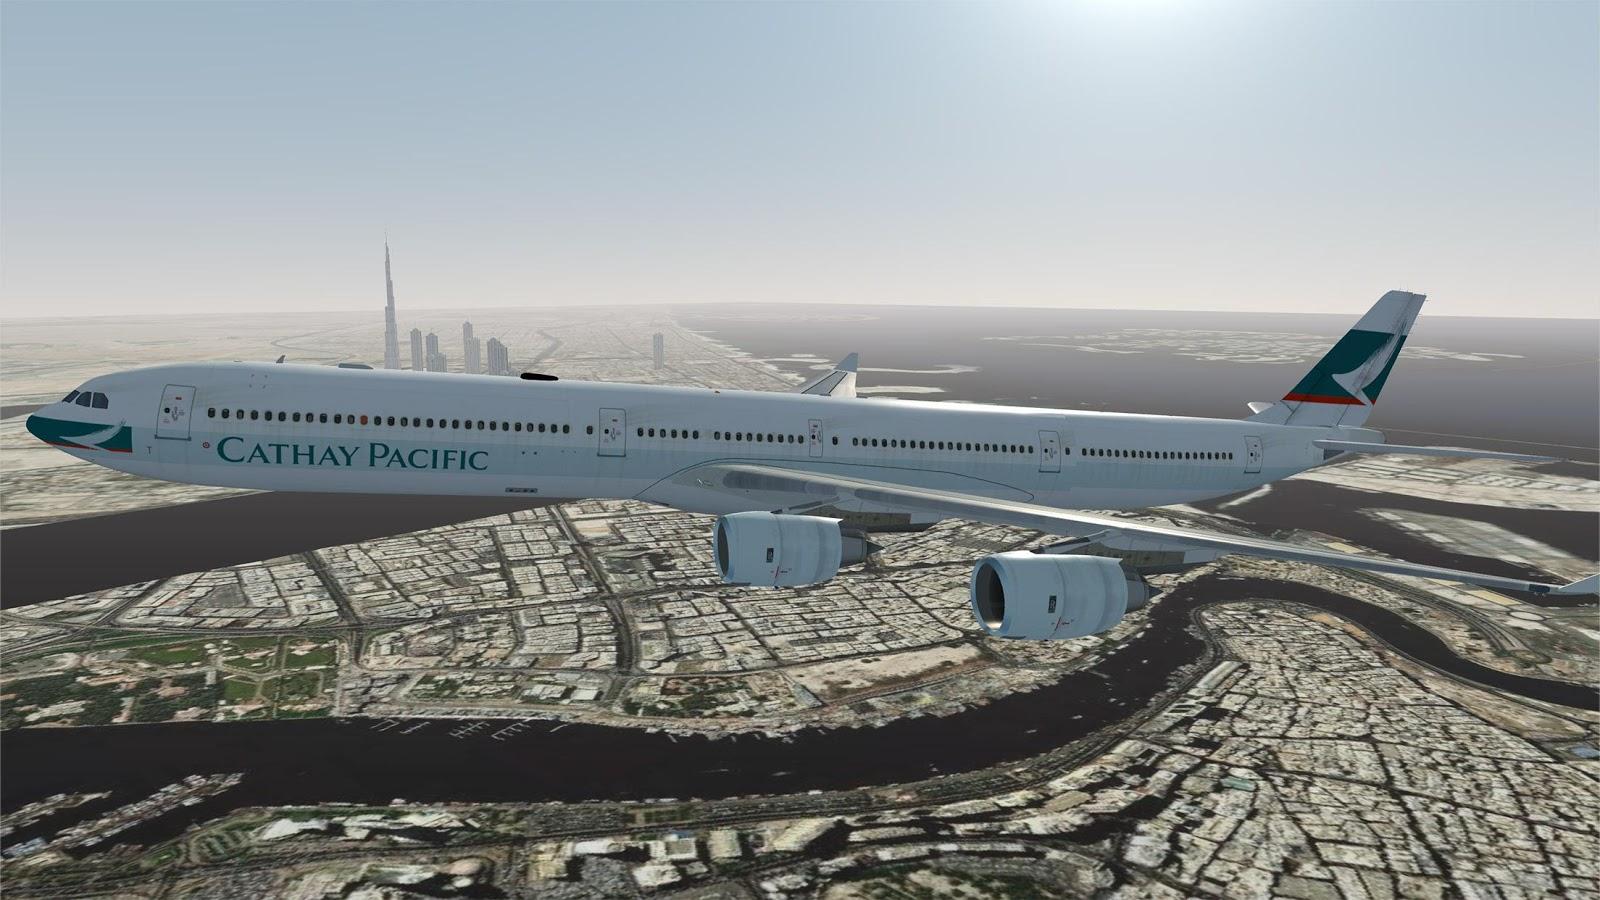 vr flight simulator panagiotis apk